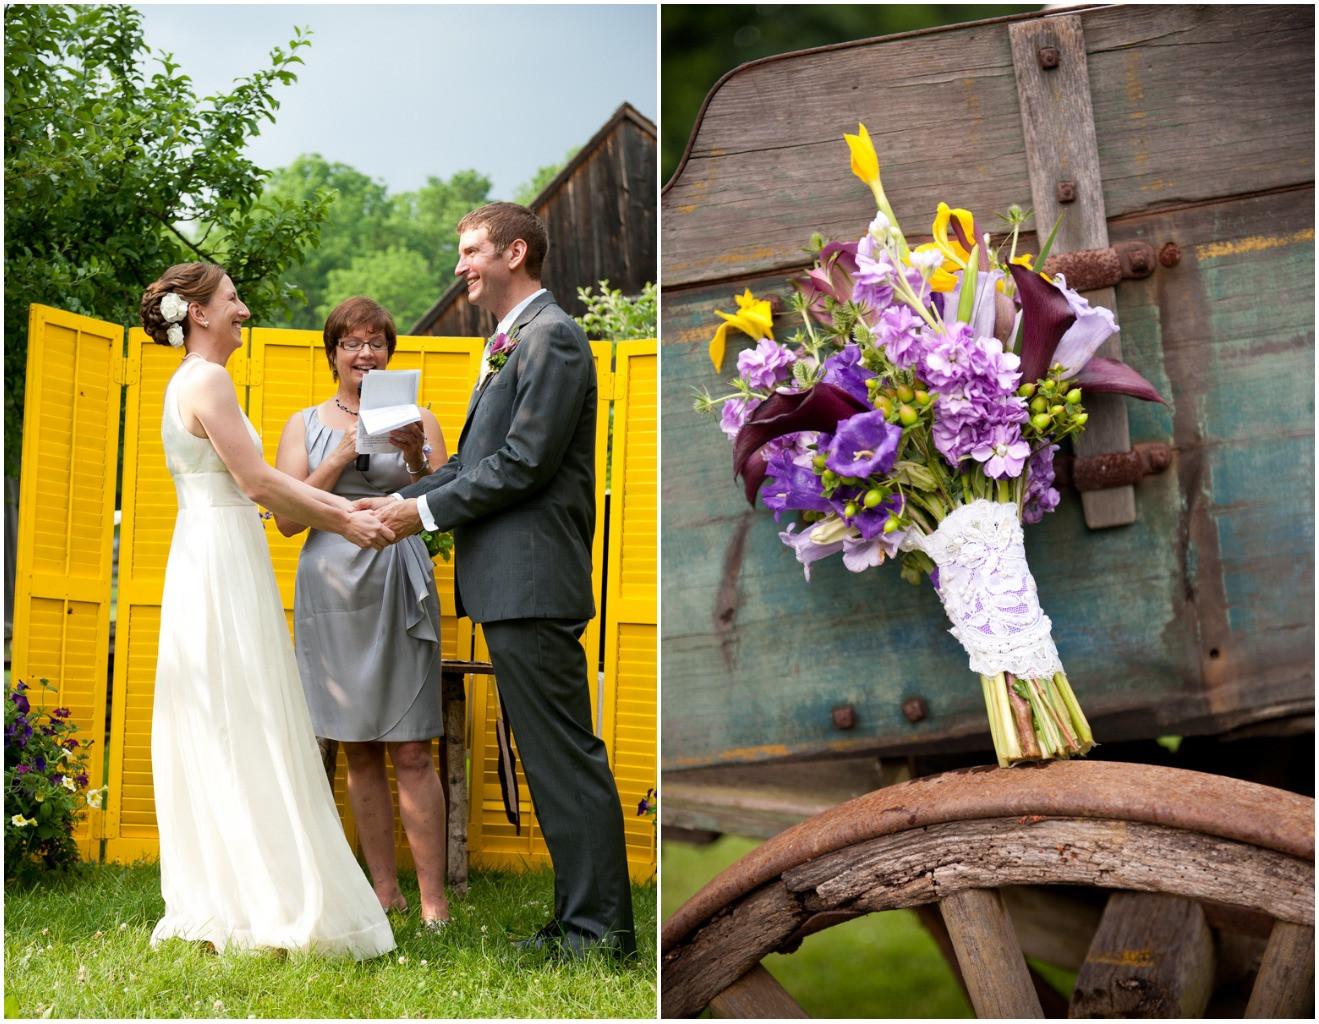 Best ideas about DIY Backyard Wedding . Save or Pin Do It Yourself Style Backyard Wedding Rustic Wedding Chic Now.